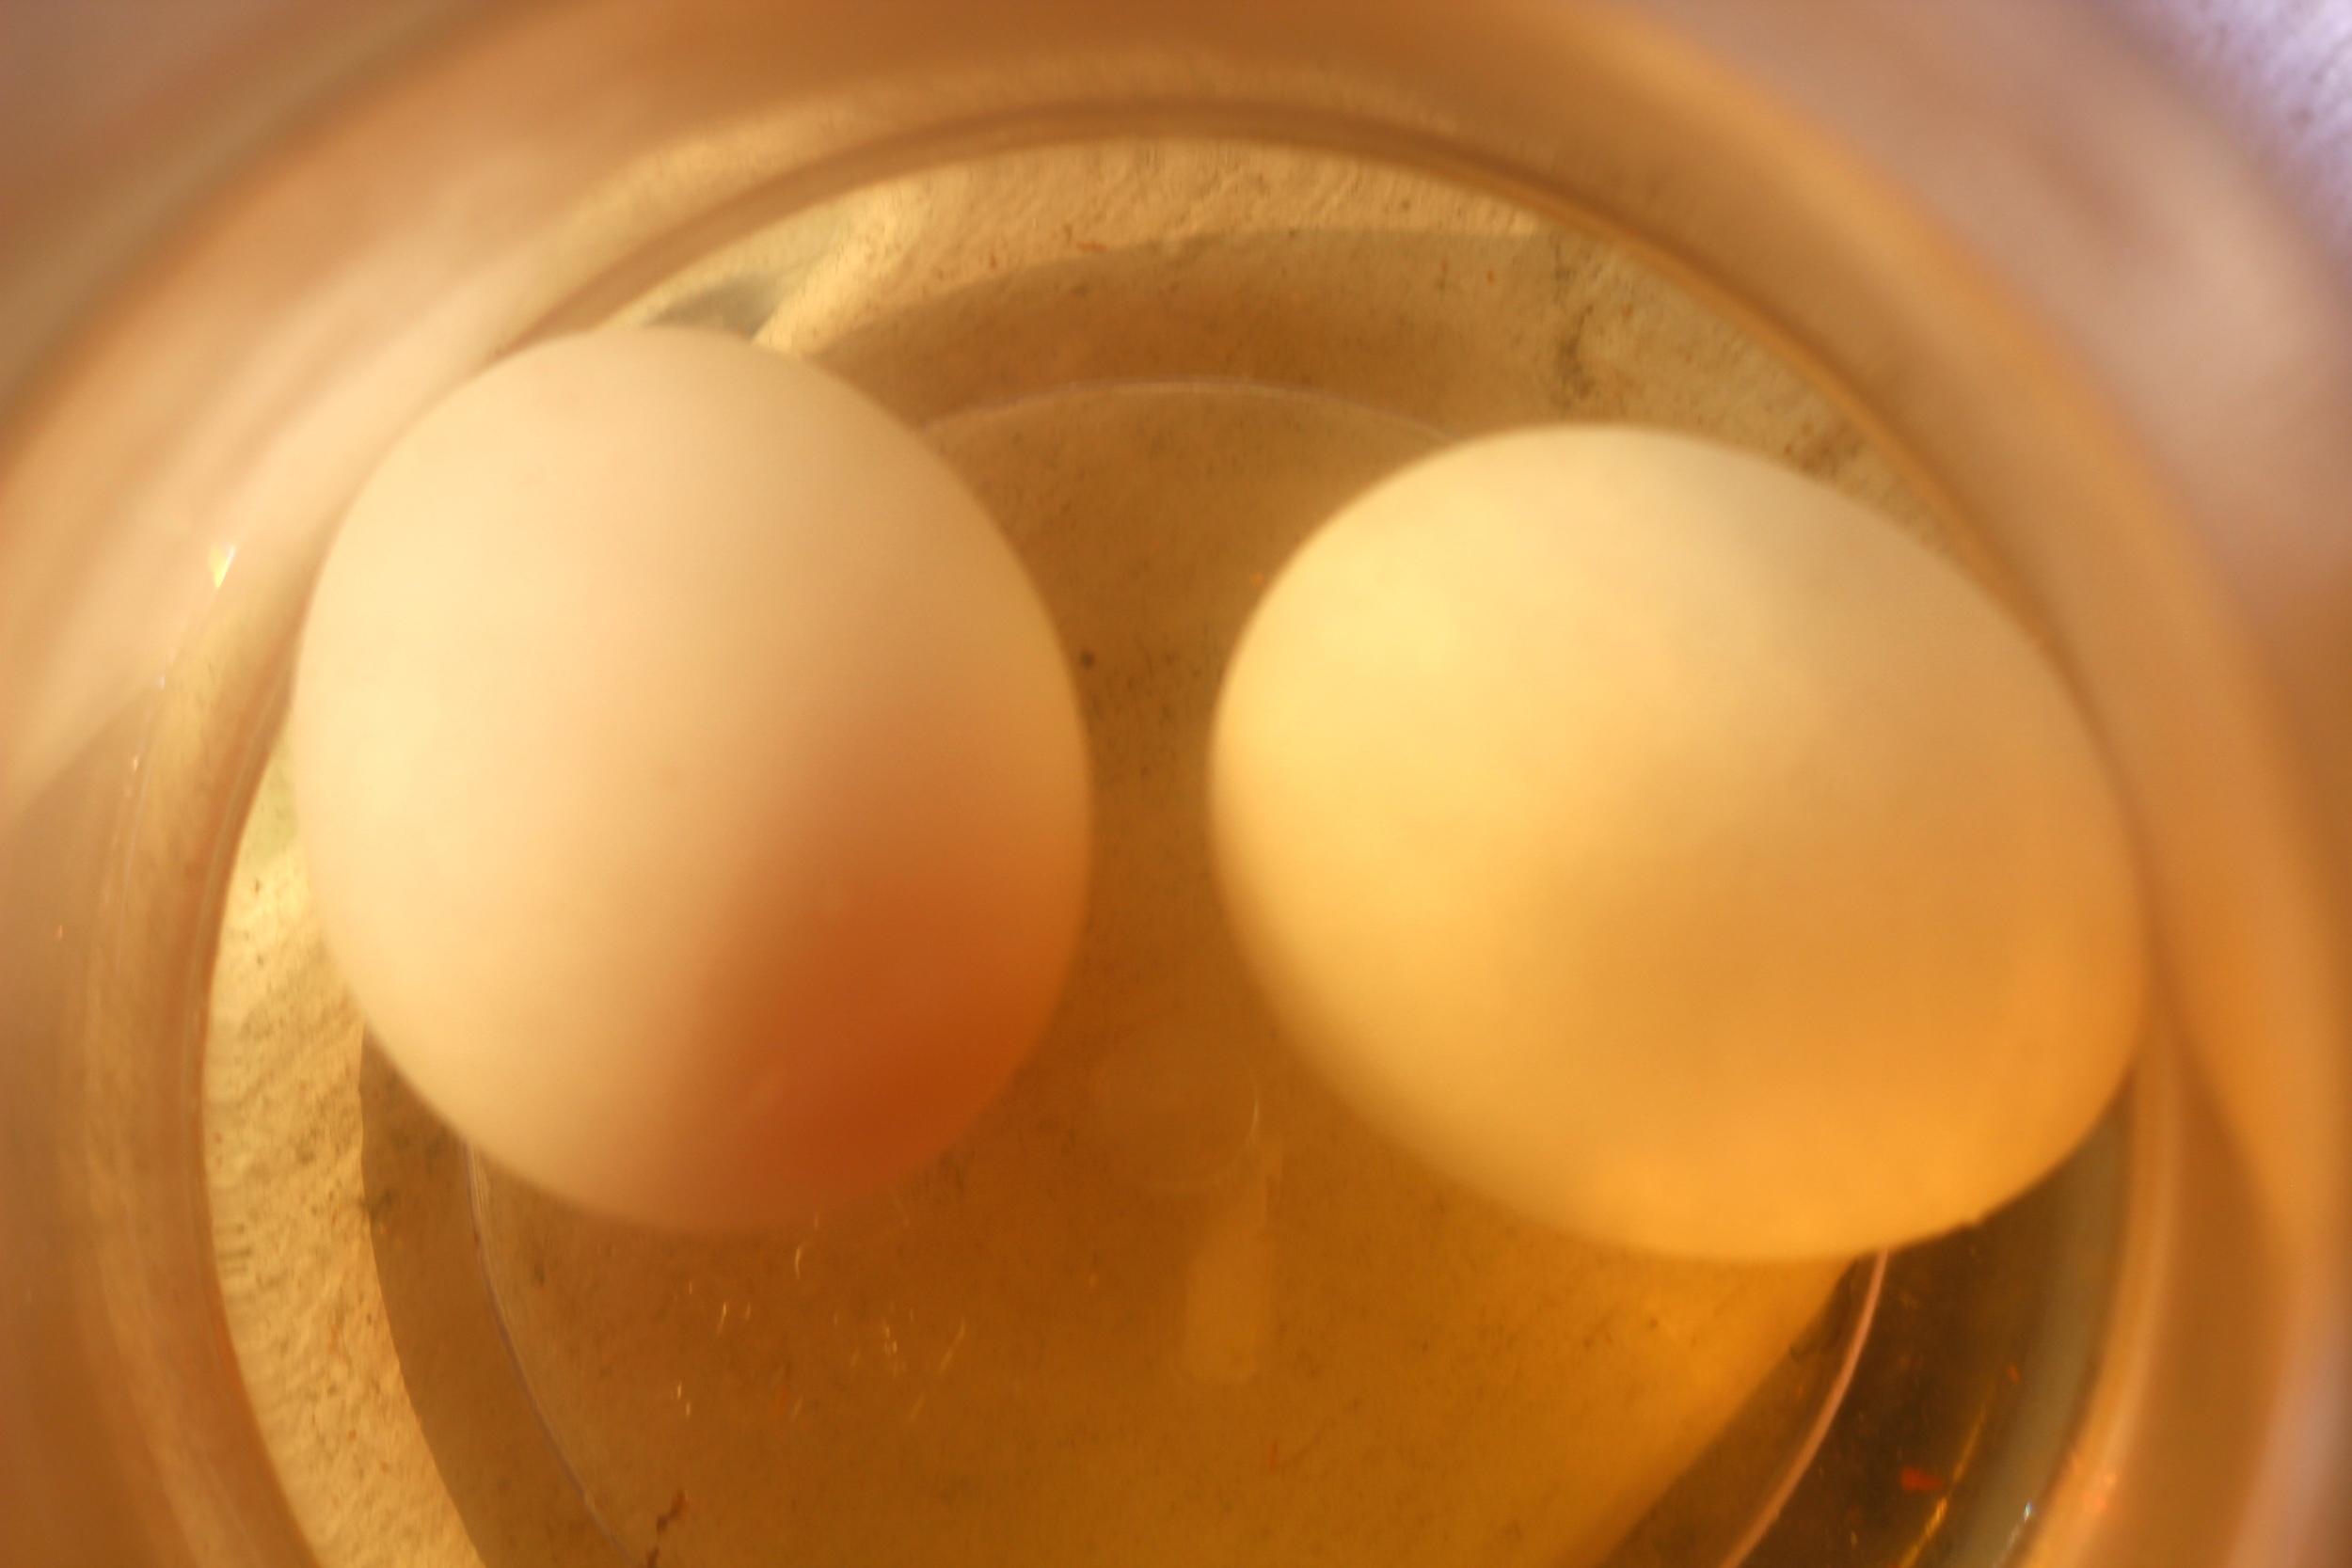 Fresh Eggs Soaking in Smoked Water